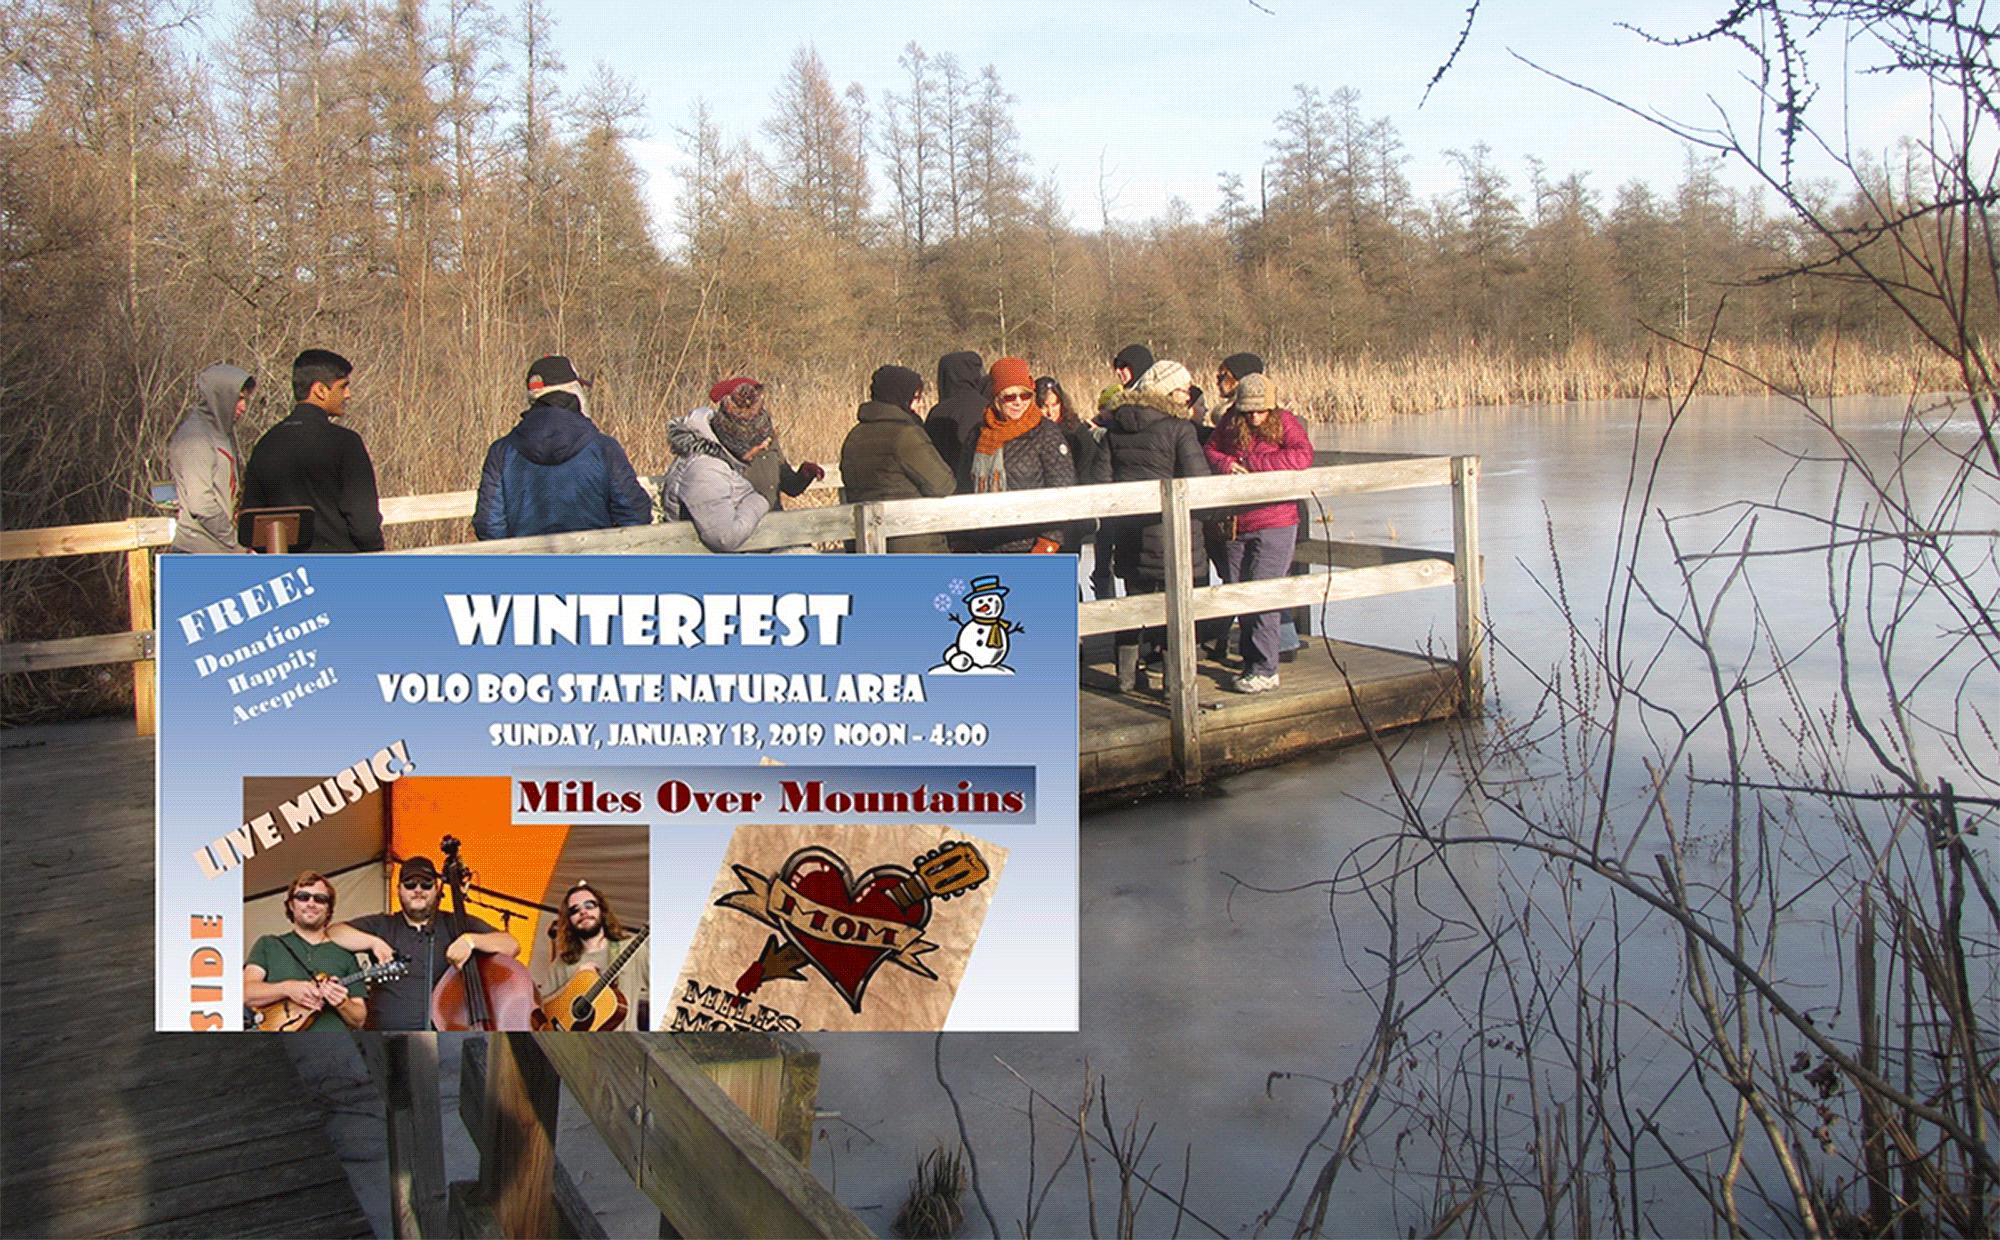 Lake County, Illinois, CVB - - Free Winterfest at Volo Bog